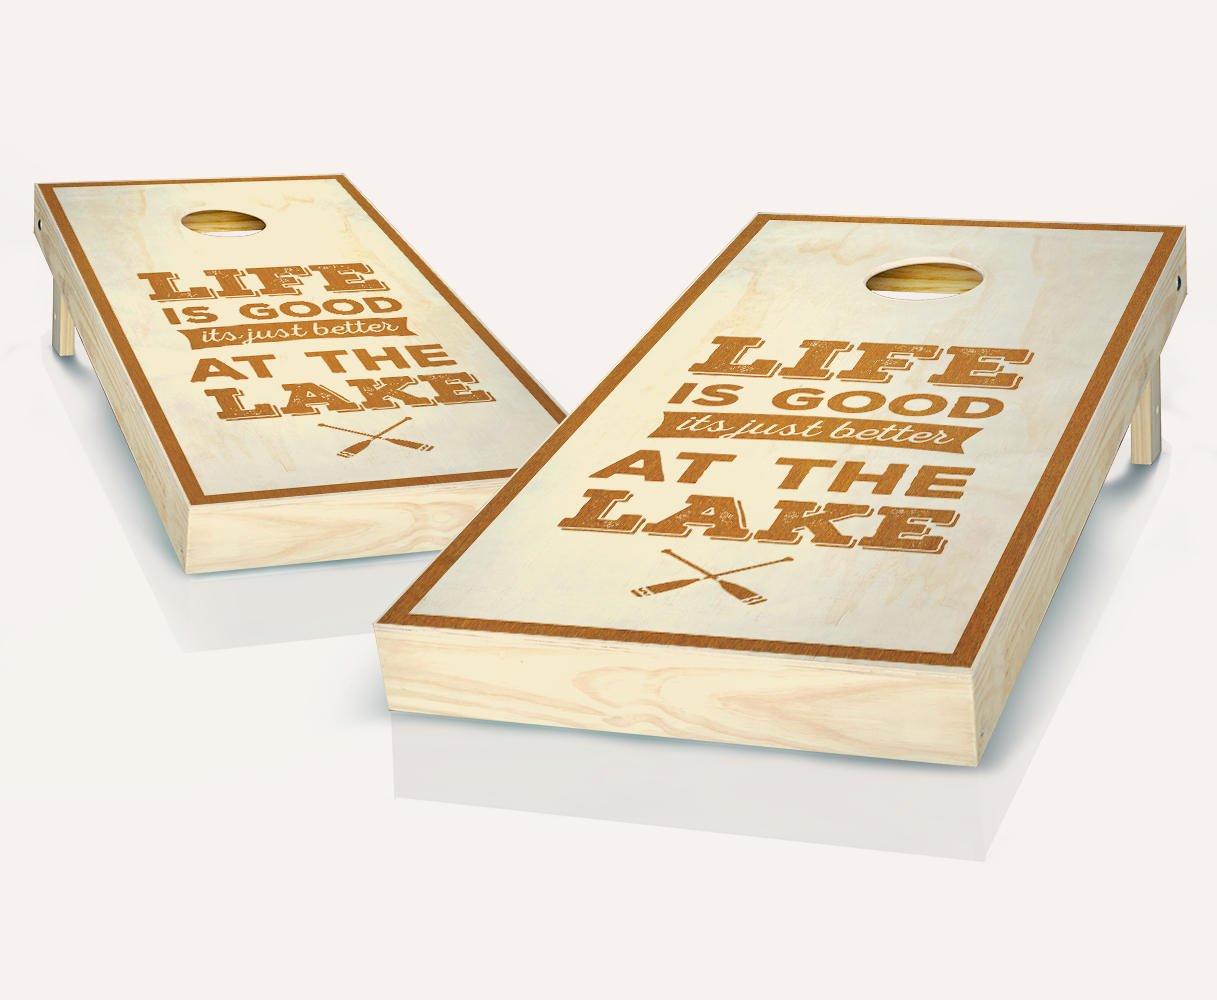 Life Is Better At The Lake Maple StainedカスタムCornholeボードregulation sizeゲームセットBaggo Bean Bag Toss + 8 ACA Regulation Bags B07CNBTKVB